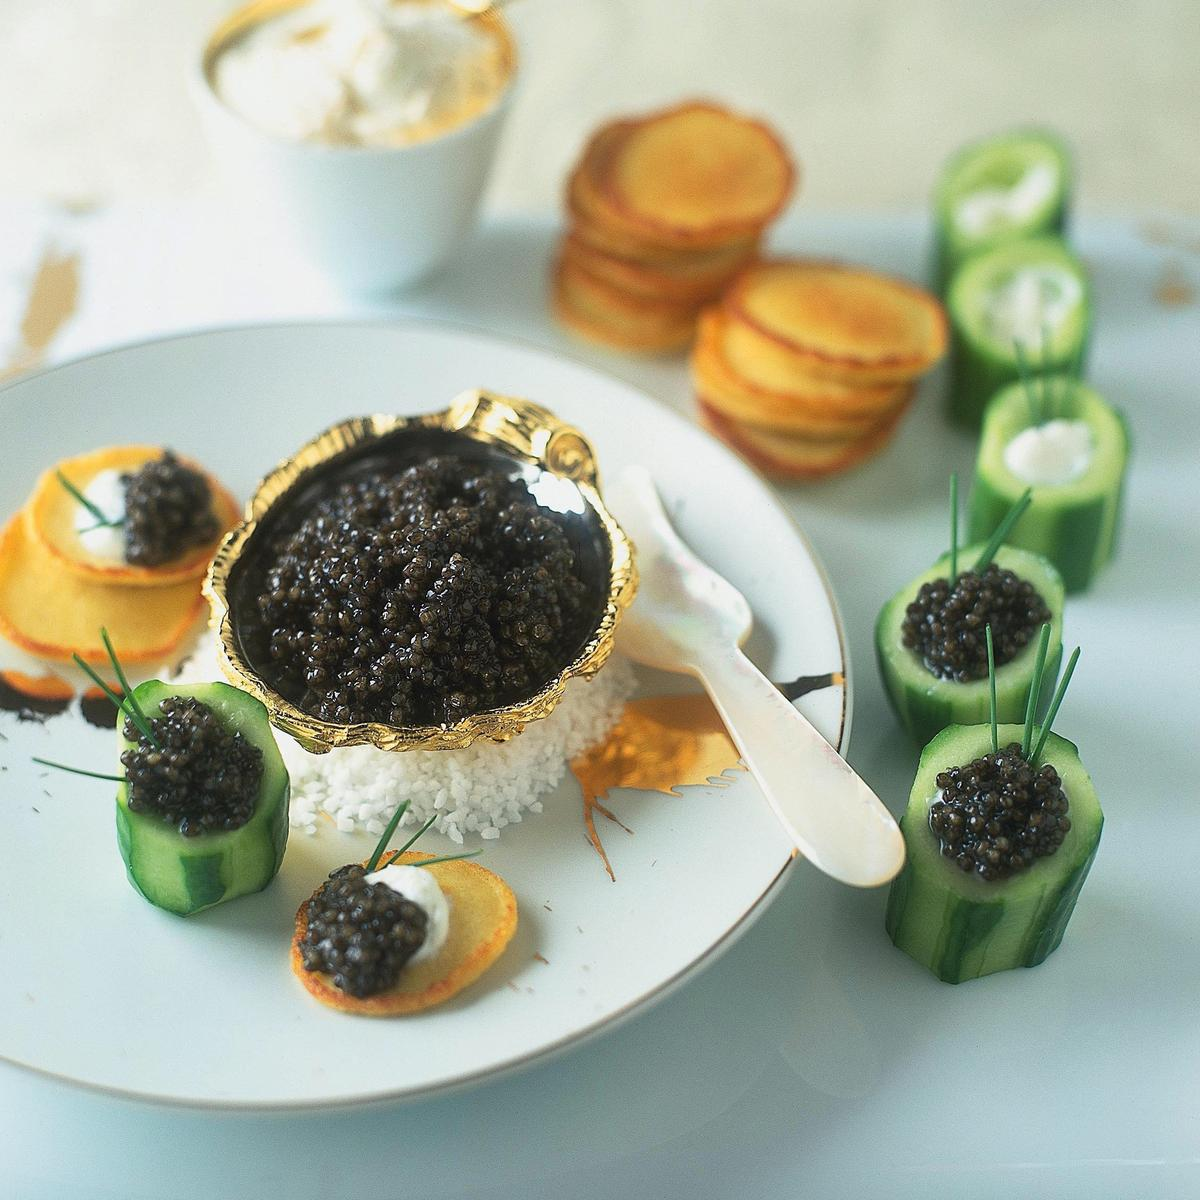 Recette amuse bouche au caviar cuisine madame figaro for Amuse bouche cuisine